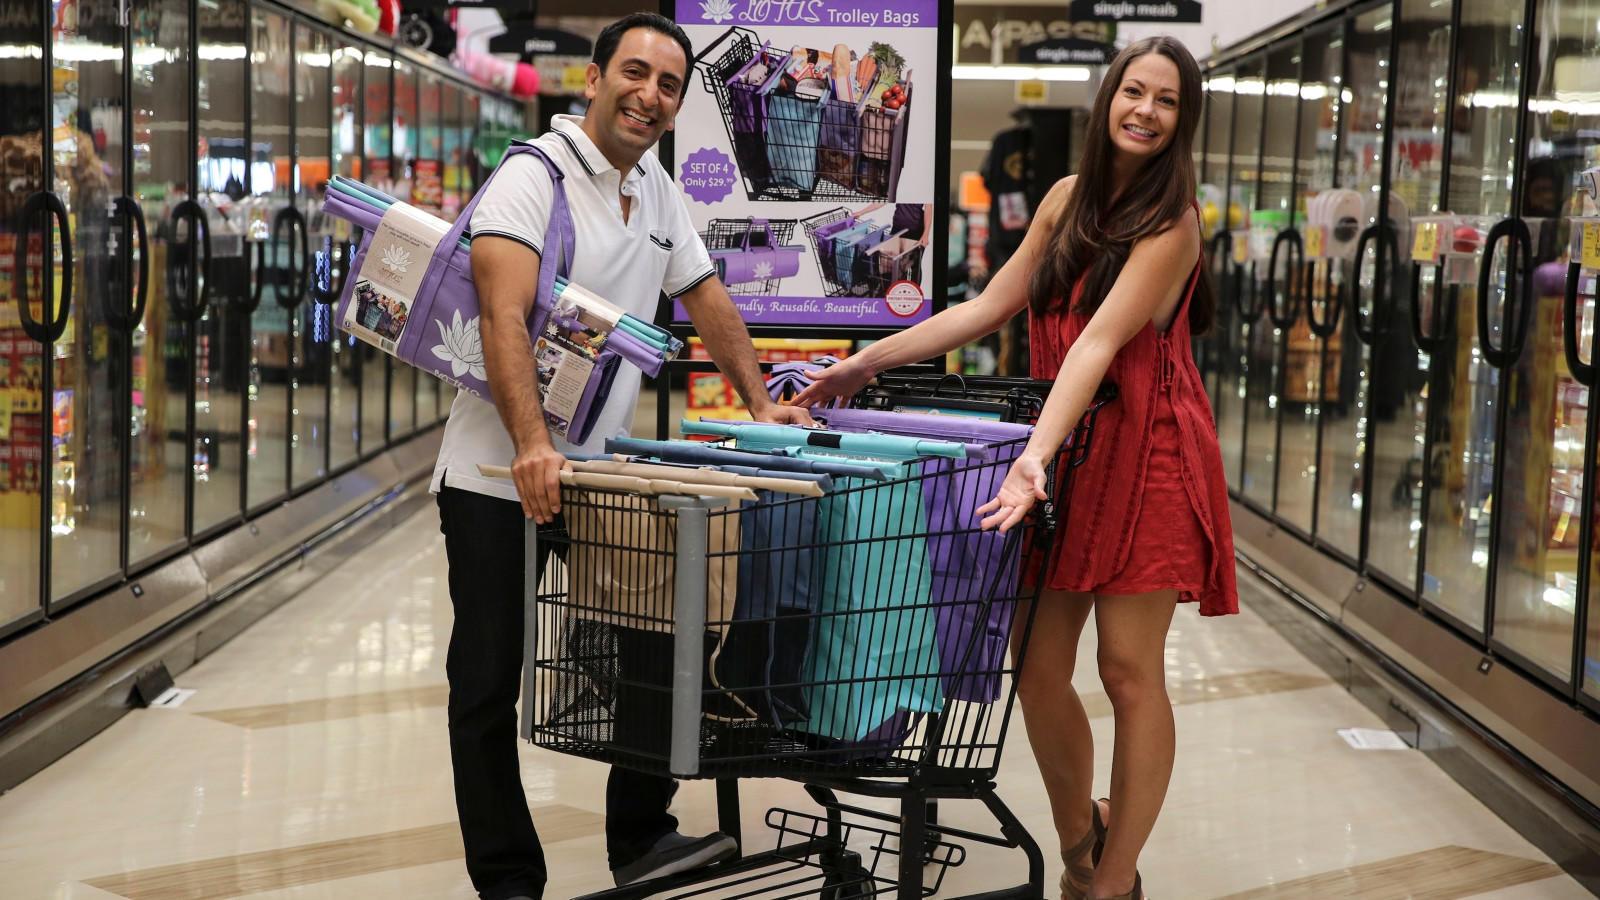 Carlsbad Set To Make Millions Off Grocery Bag S The San Go Union Tribune